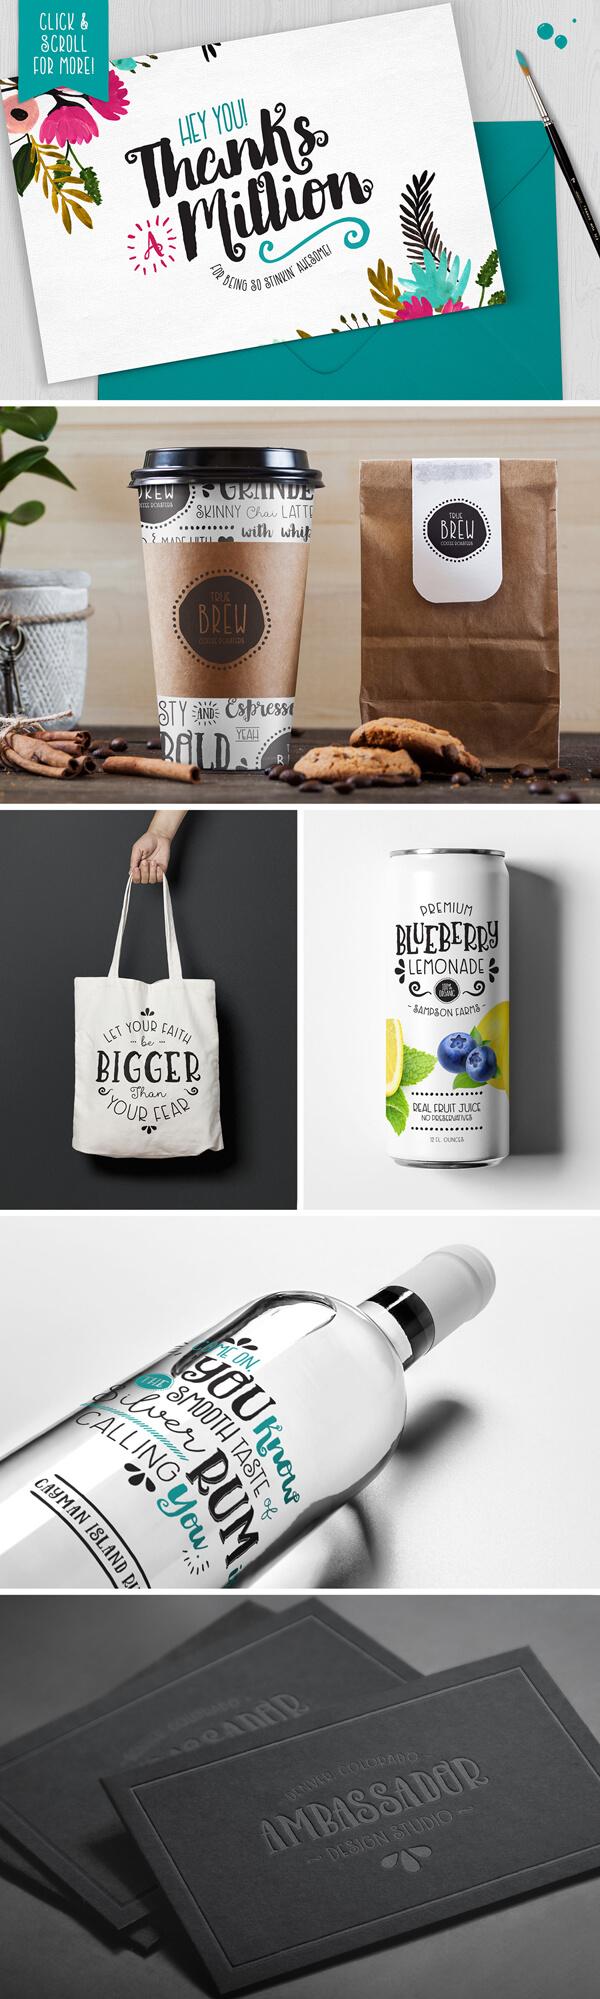 Graphic Design Inspiration #14